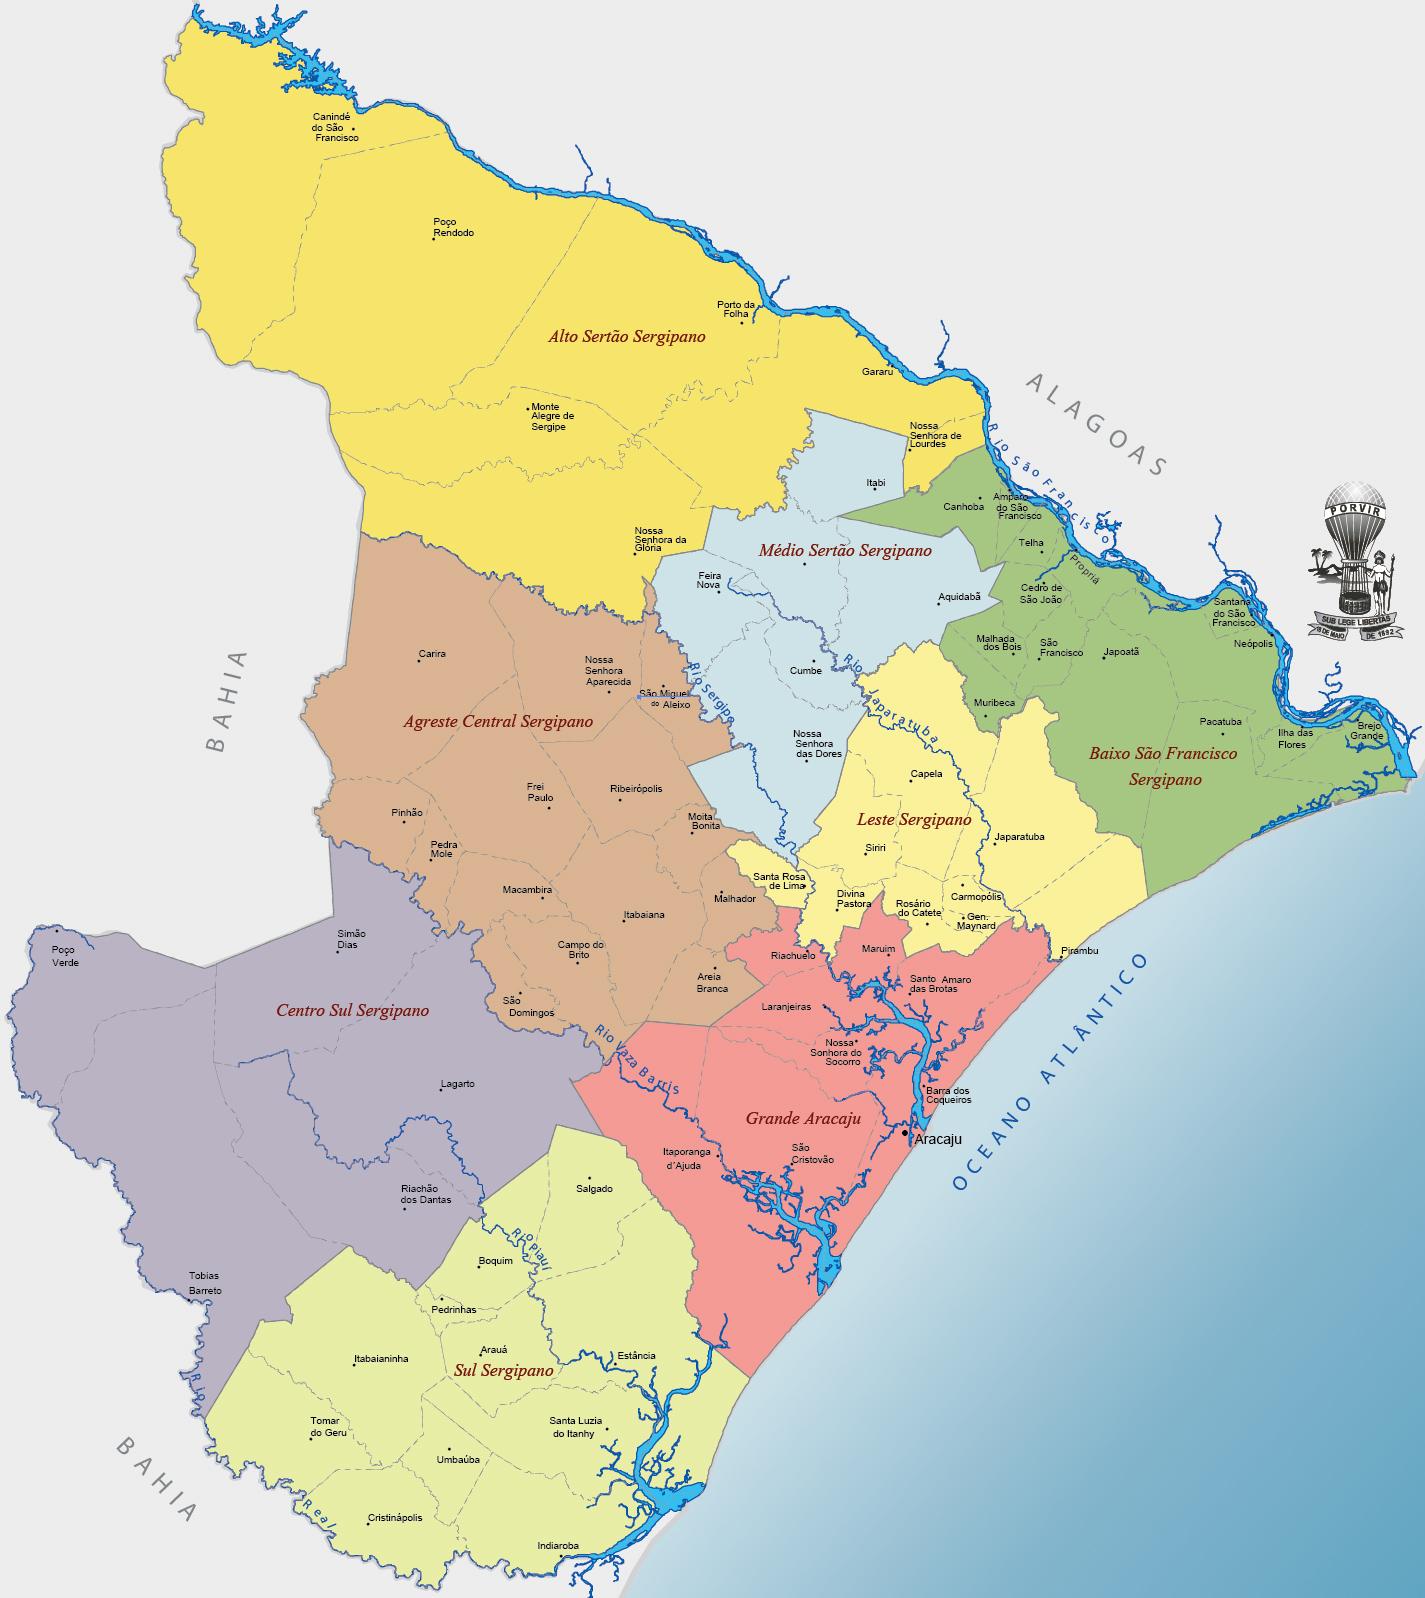 Sergipe | Top 10 Maiores Cidades do Estado de Sergipe